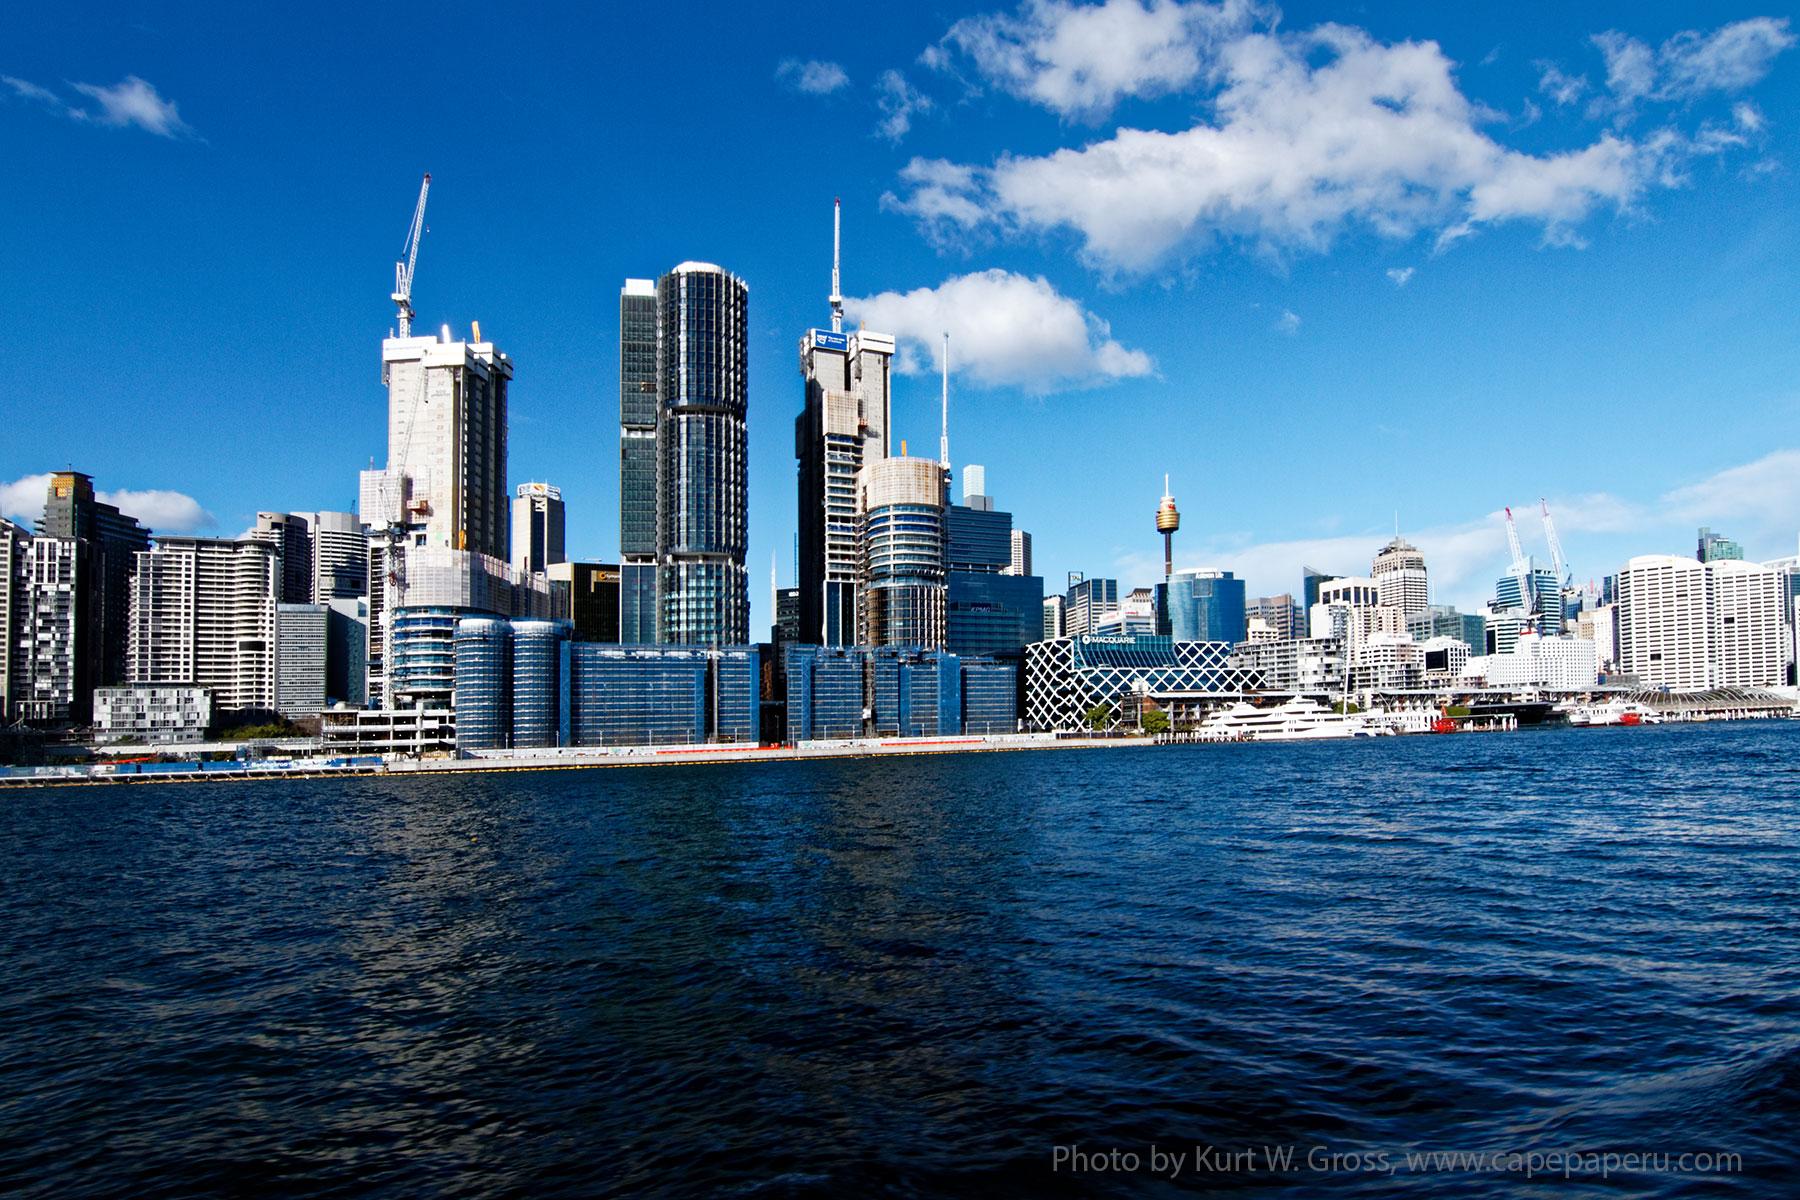 Darling Harbour Wharf, Sydney, Australia